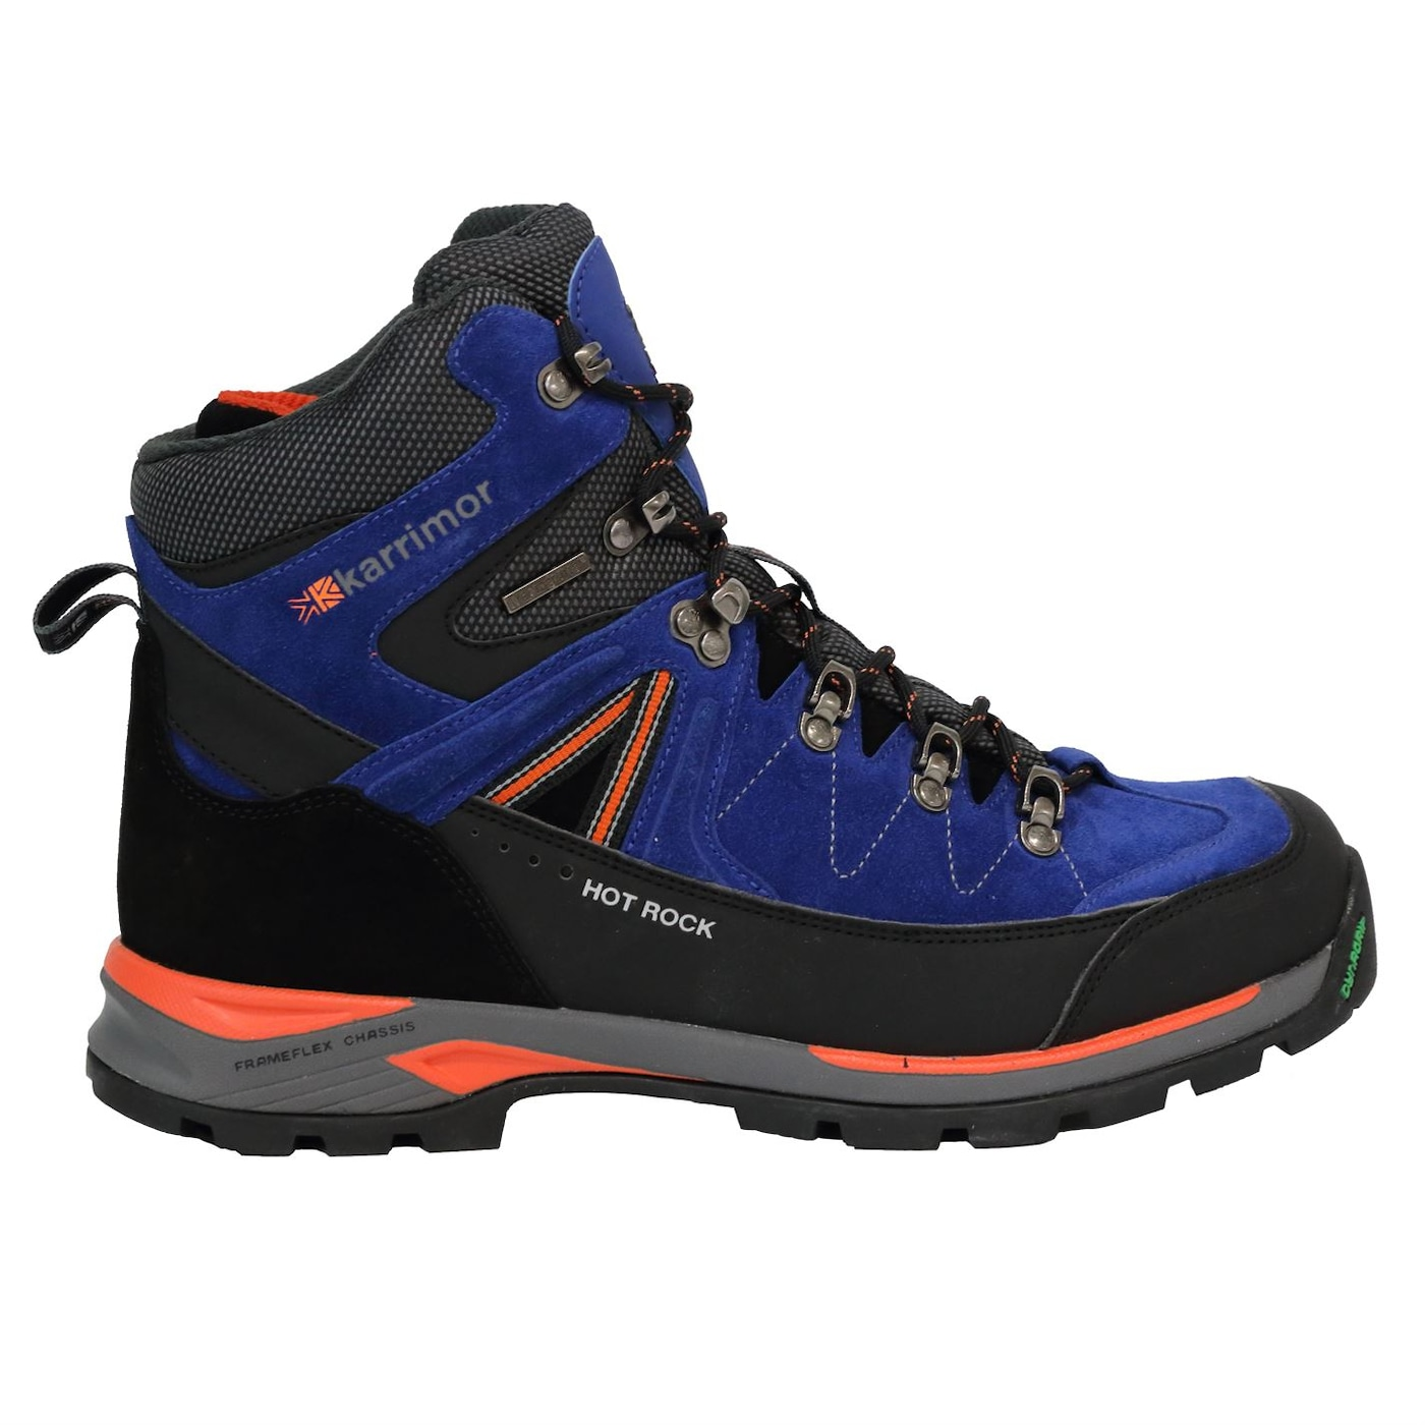 Karrimor Hot Rock pánské Walking Boots